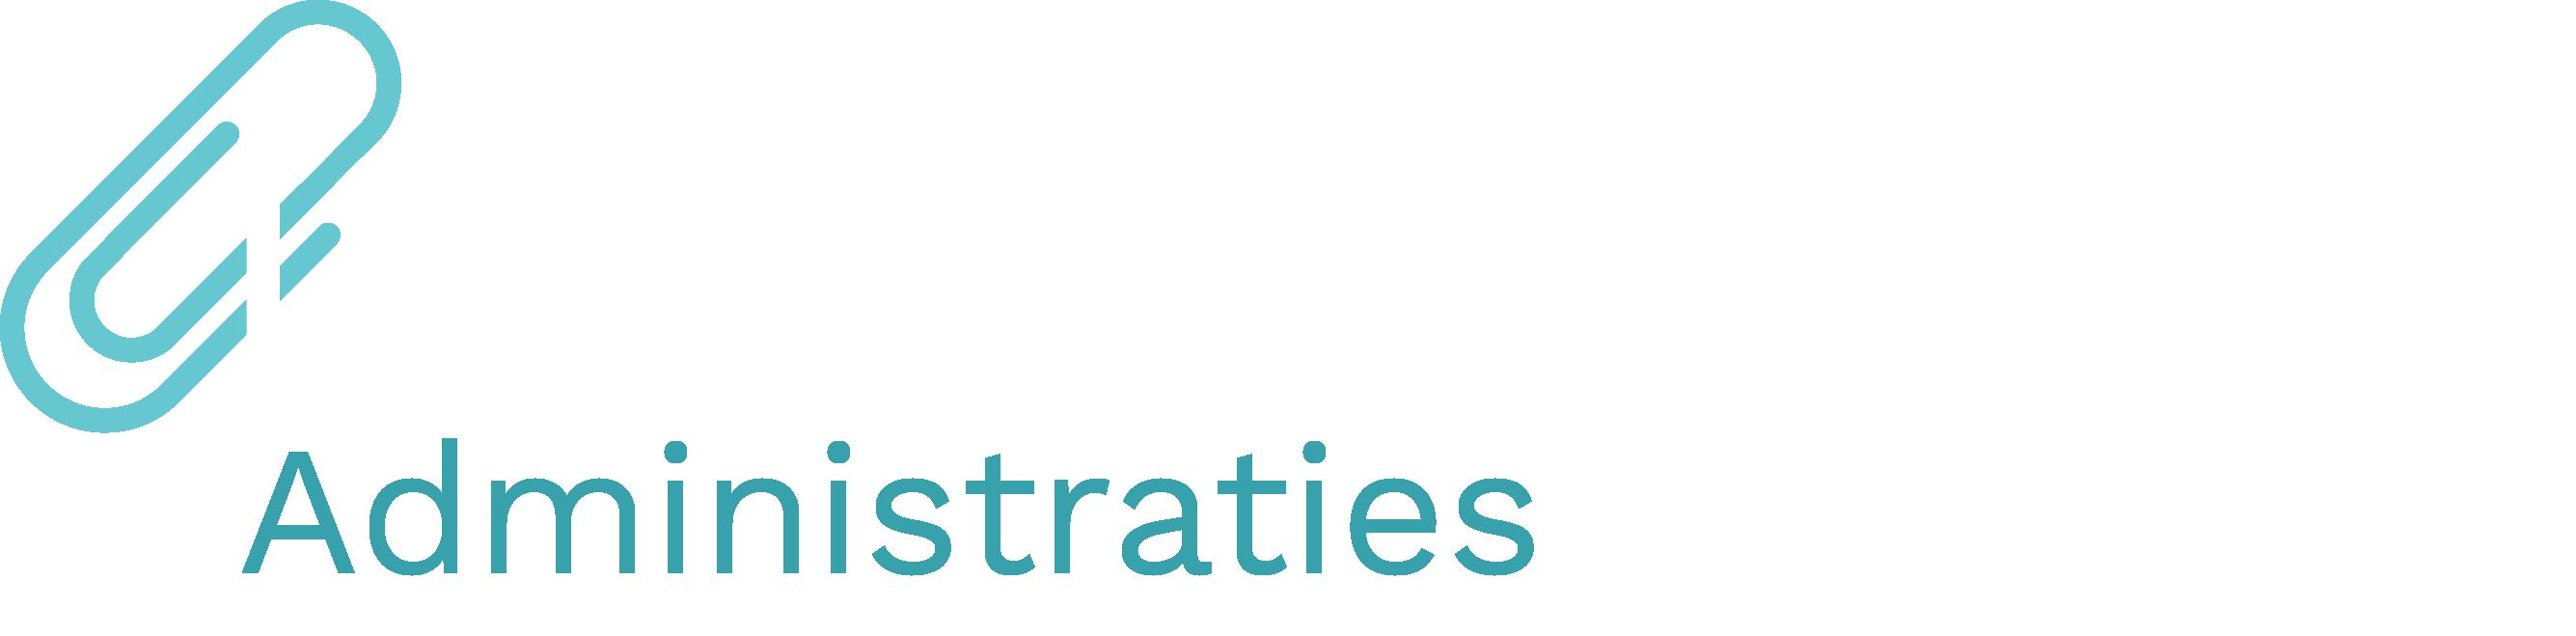 Logo DLadministraties